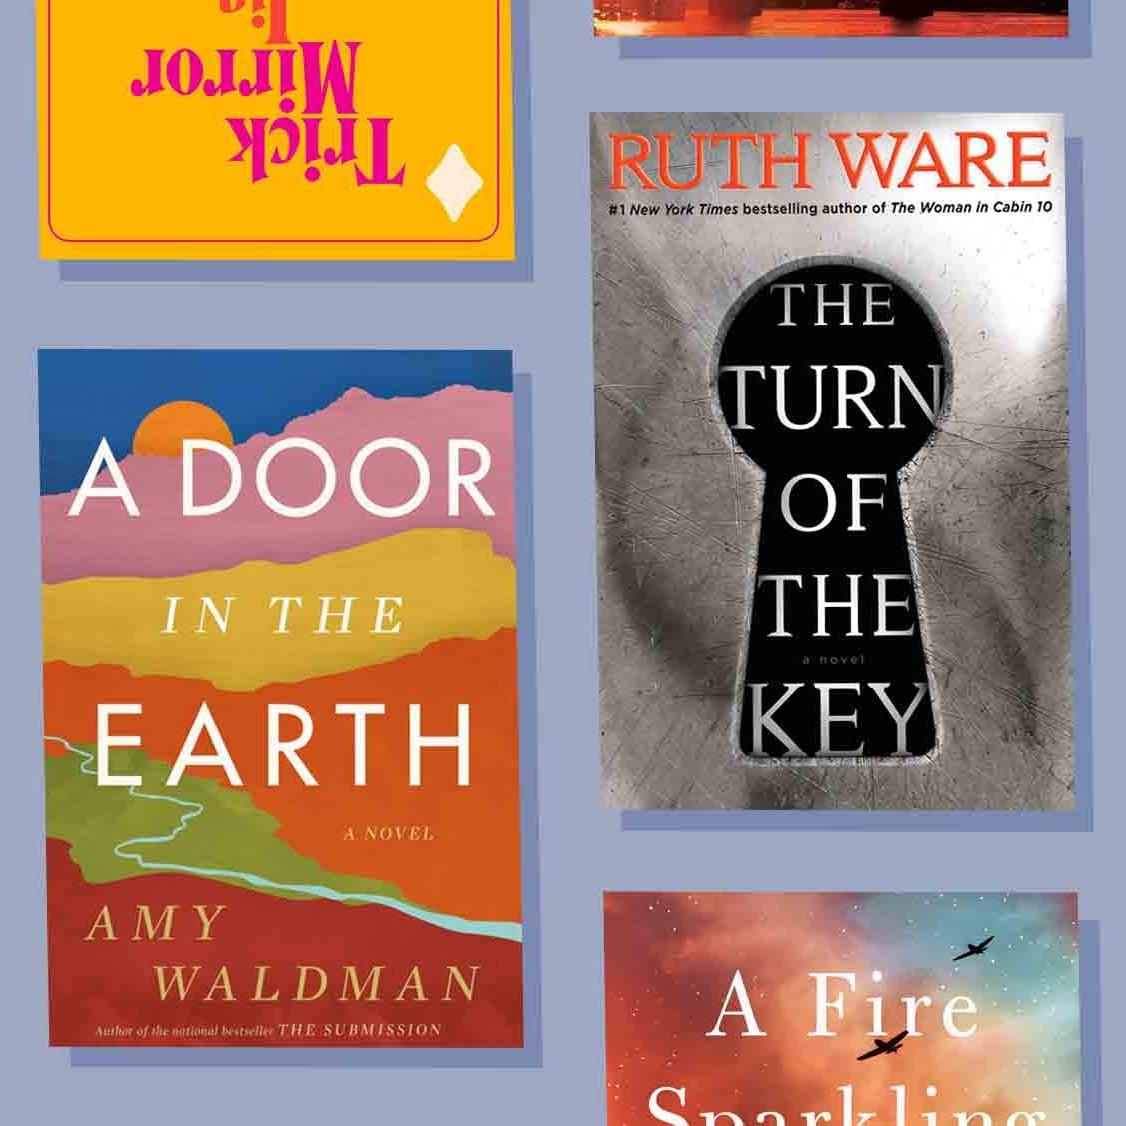 Best Books August 2019 Best New Books to Read in August 2019 | POPSUGAR Entertainment